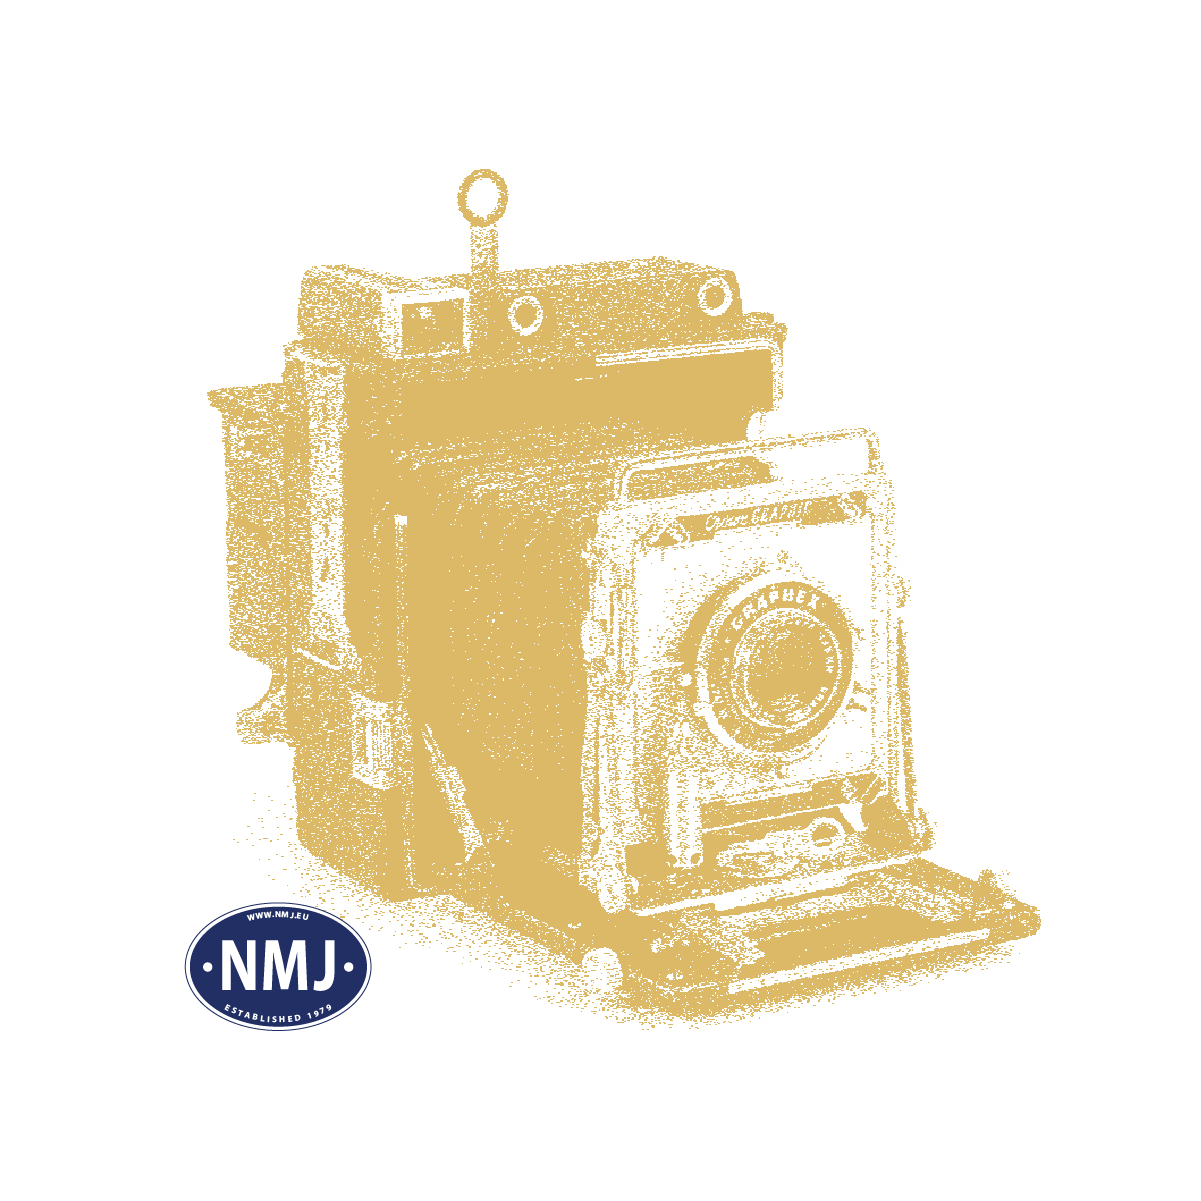 ZIMMX600 - MX600 Digitaldekoder, DCC / MM, 25 x 11 x 2 mm, 4 Funksjonsutganger, Railcom